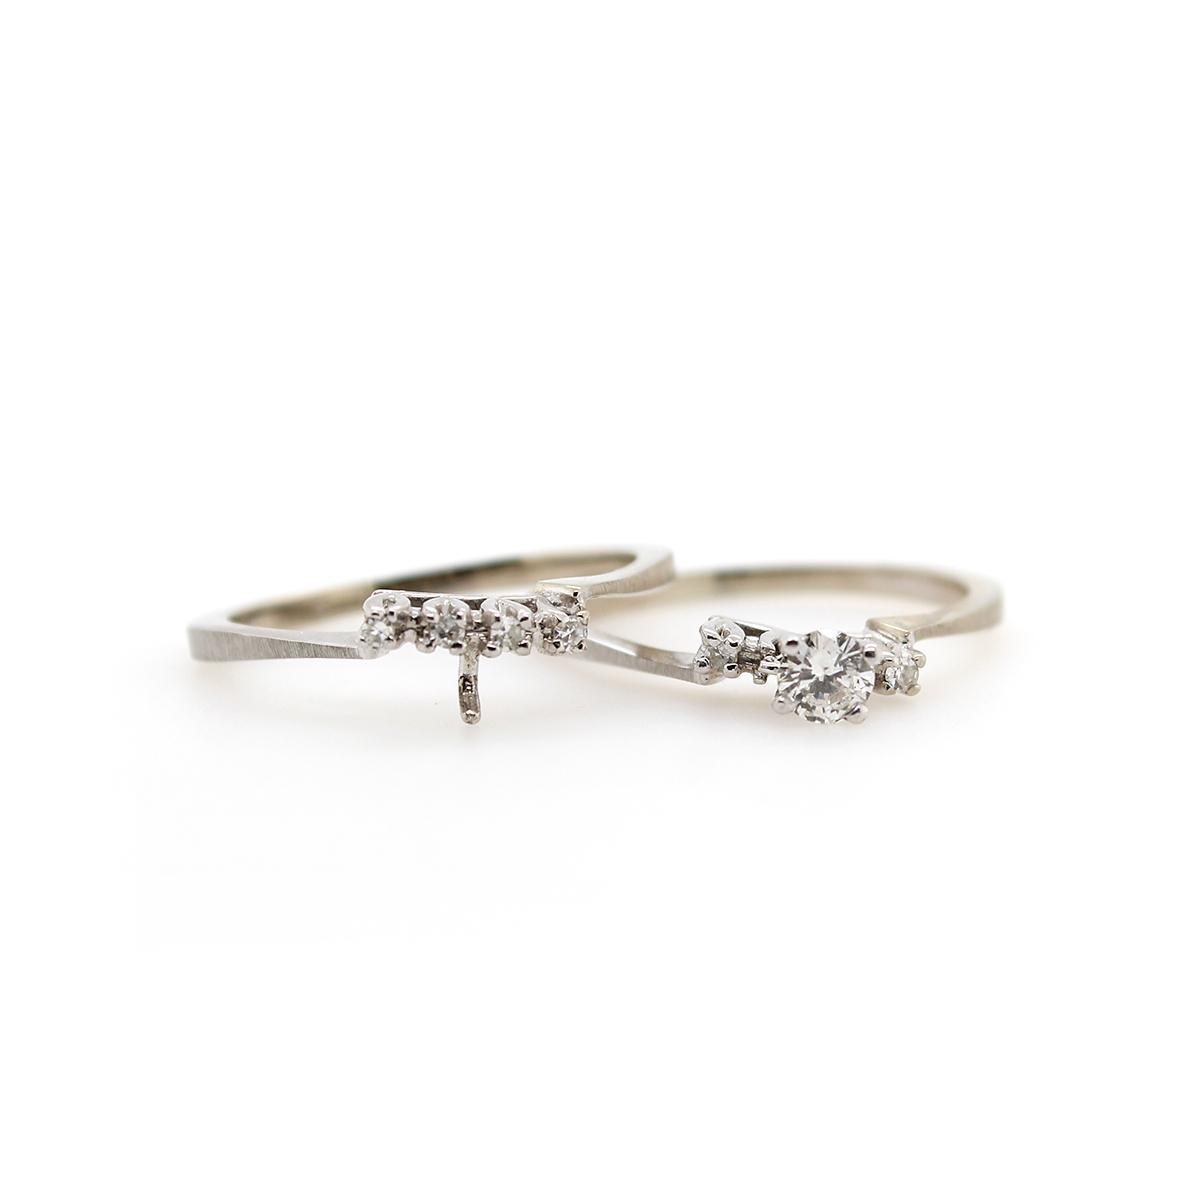 Vintage 14 Karat White Gold Diamond Bridal Set